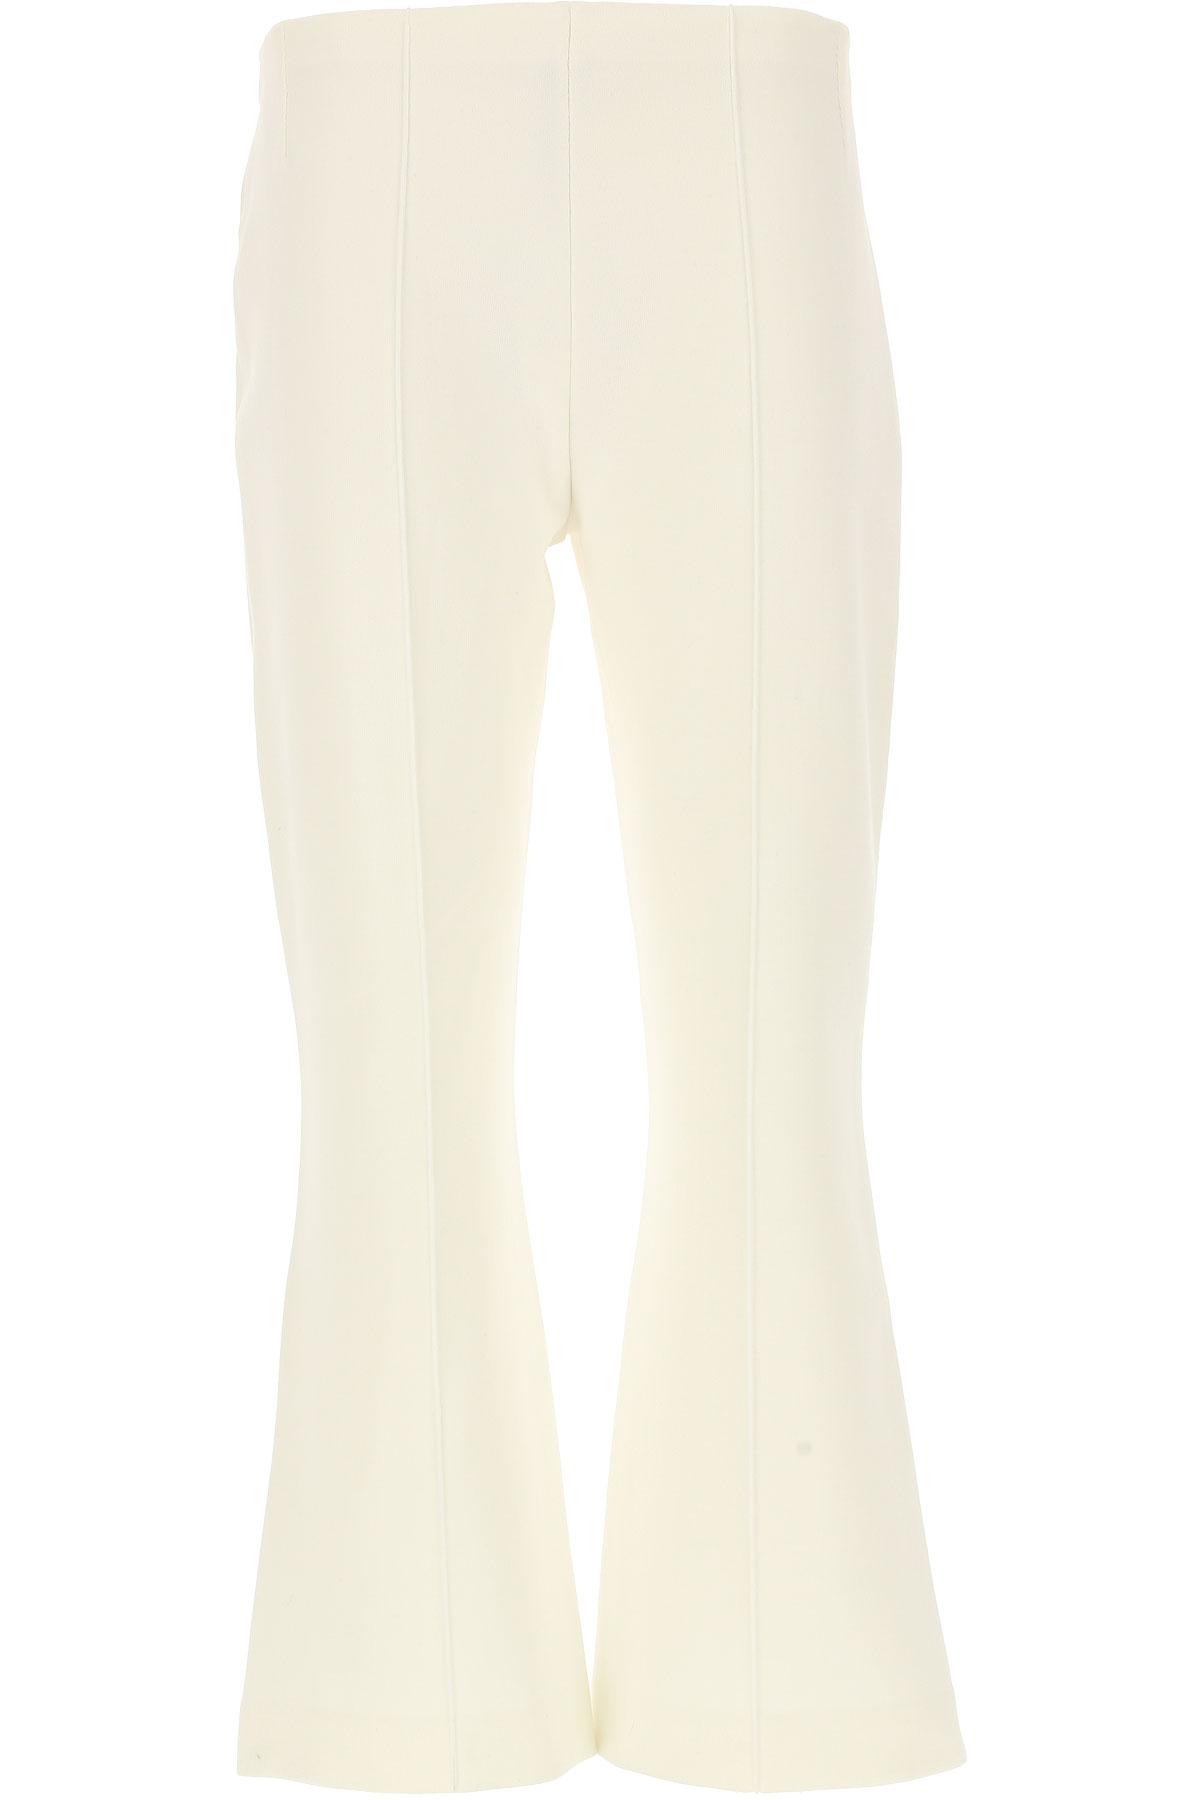 Image of Sonia Rykiel Pants for Women, White, Virgin wool, 2017, 6 8